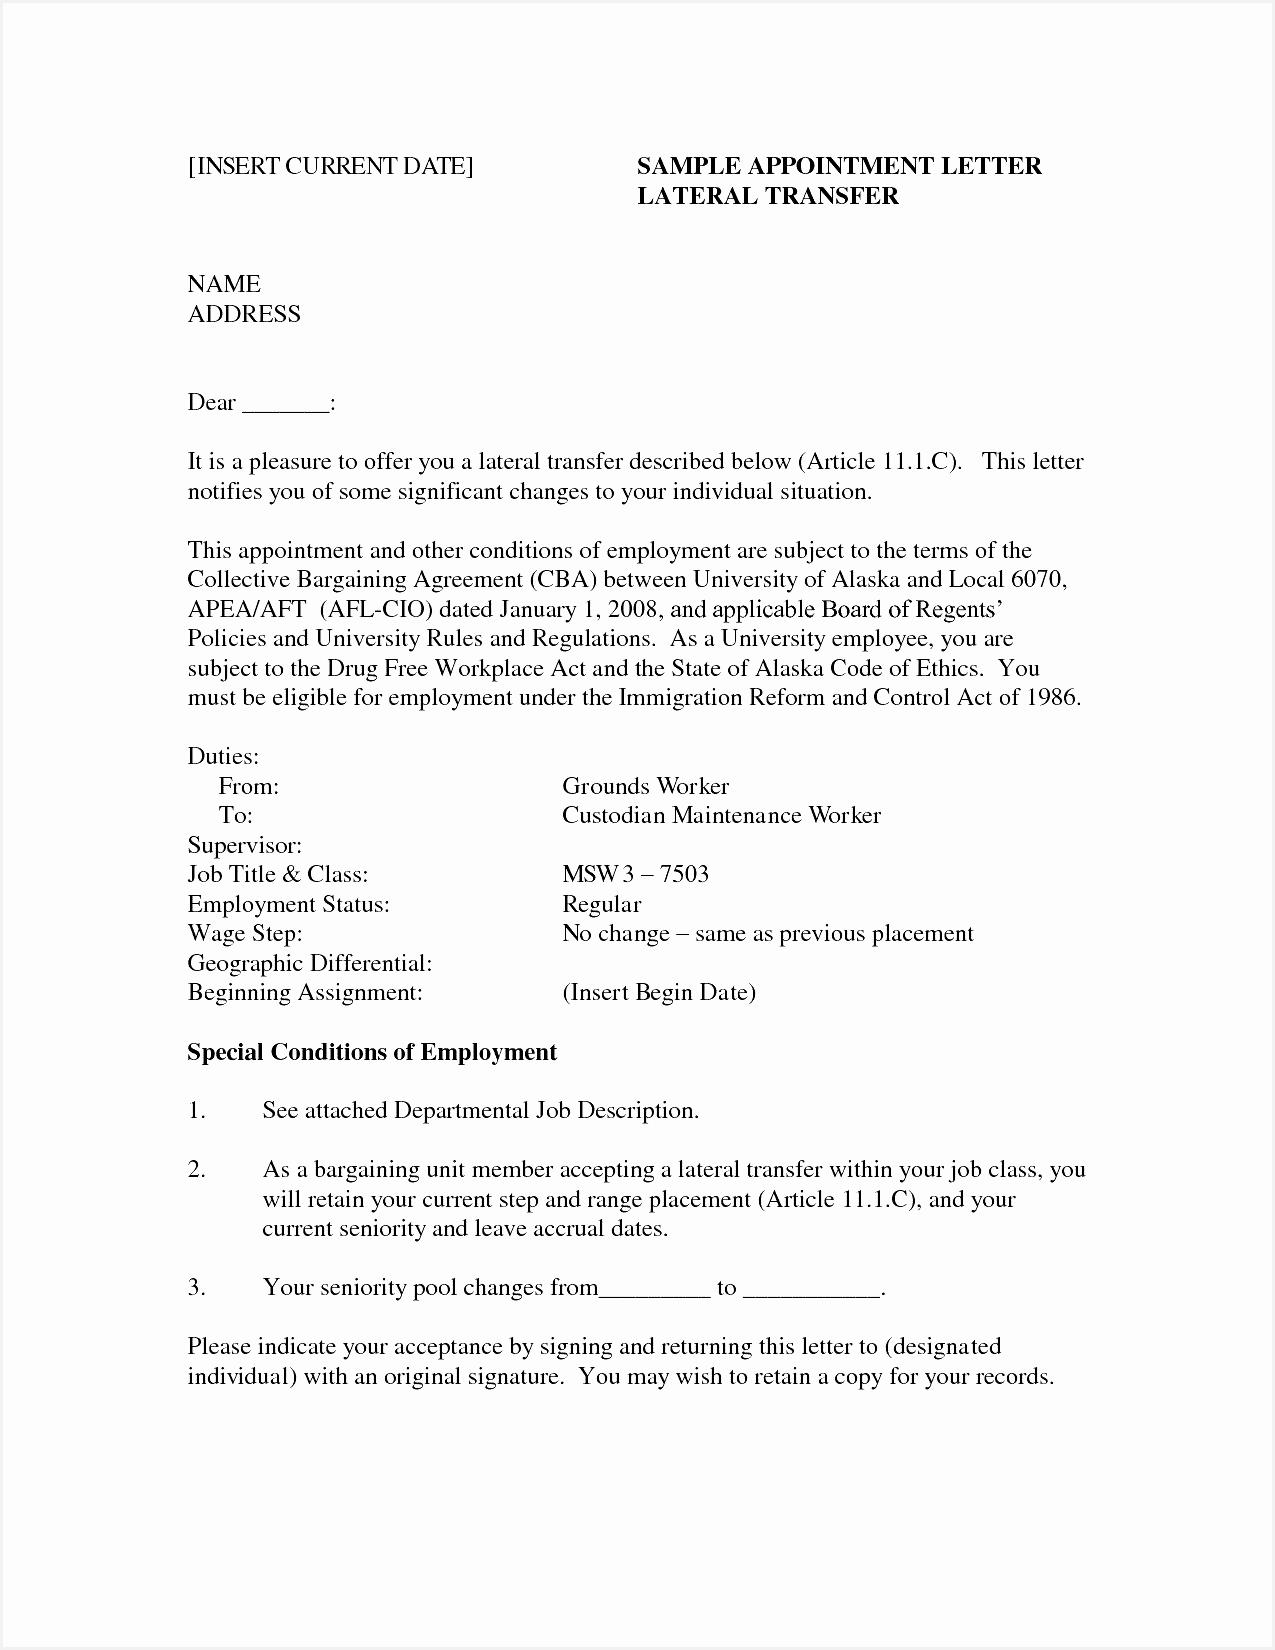 Free Resume Template Word Elegant Cover Letter Template Word 2014 Fresh Relocation Cover Letters Od16501275